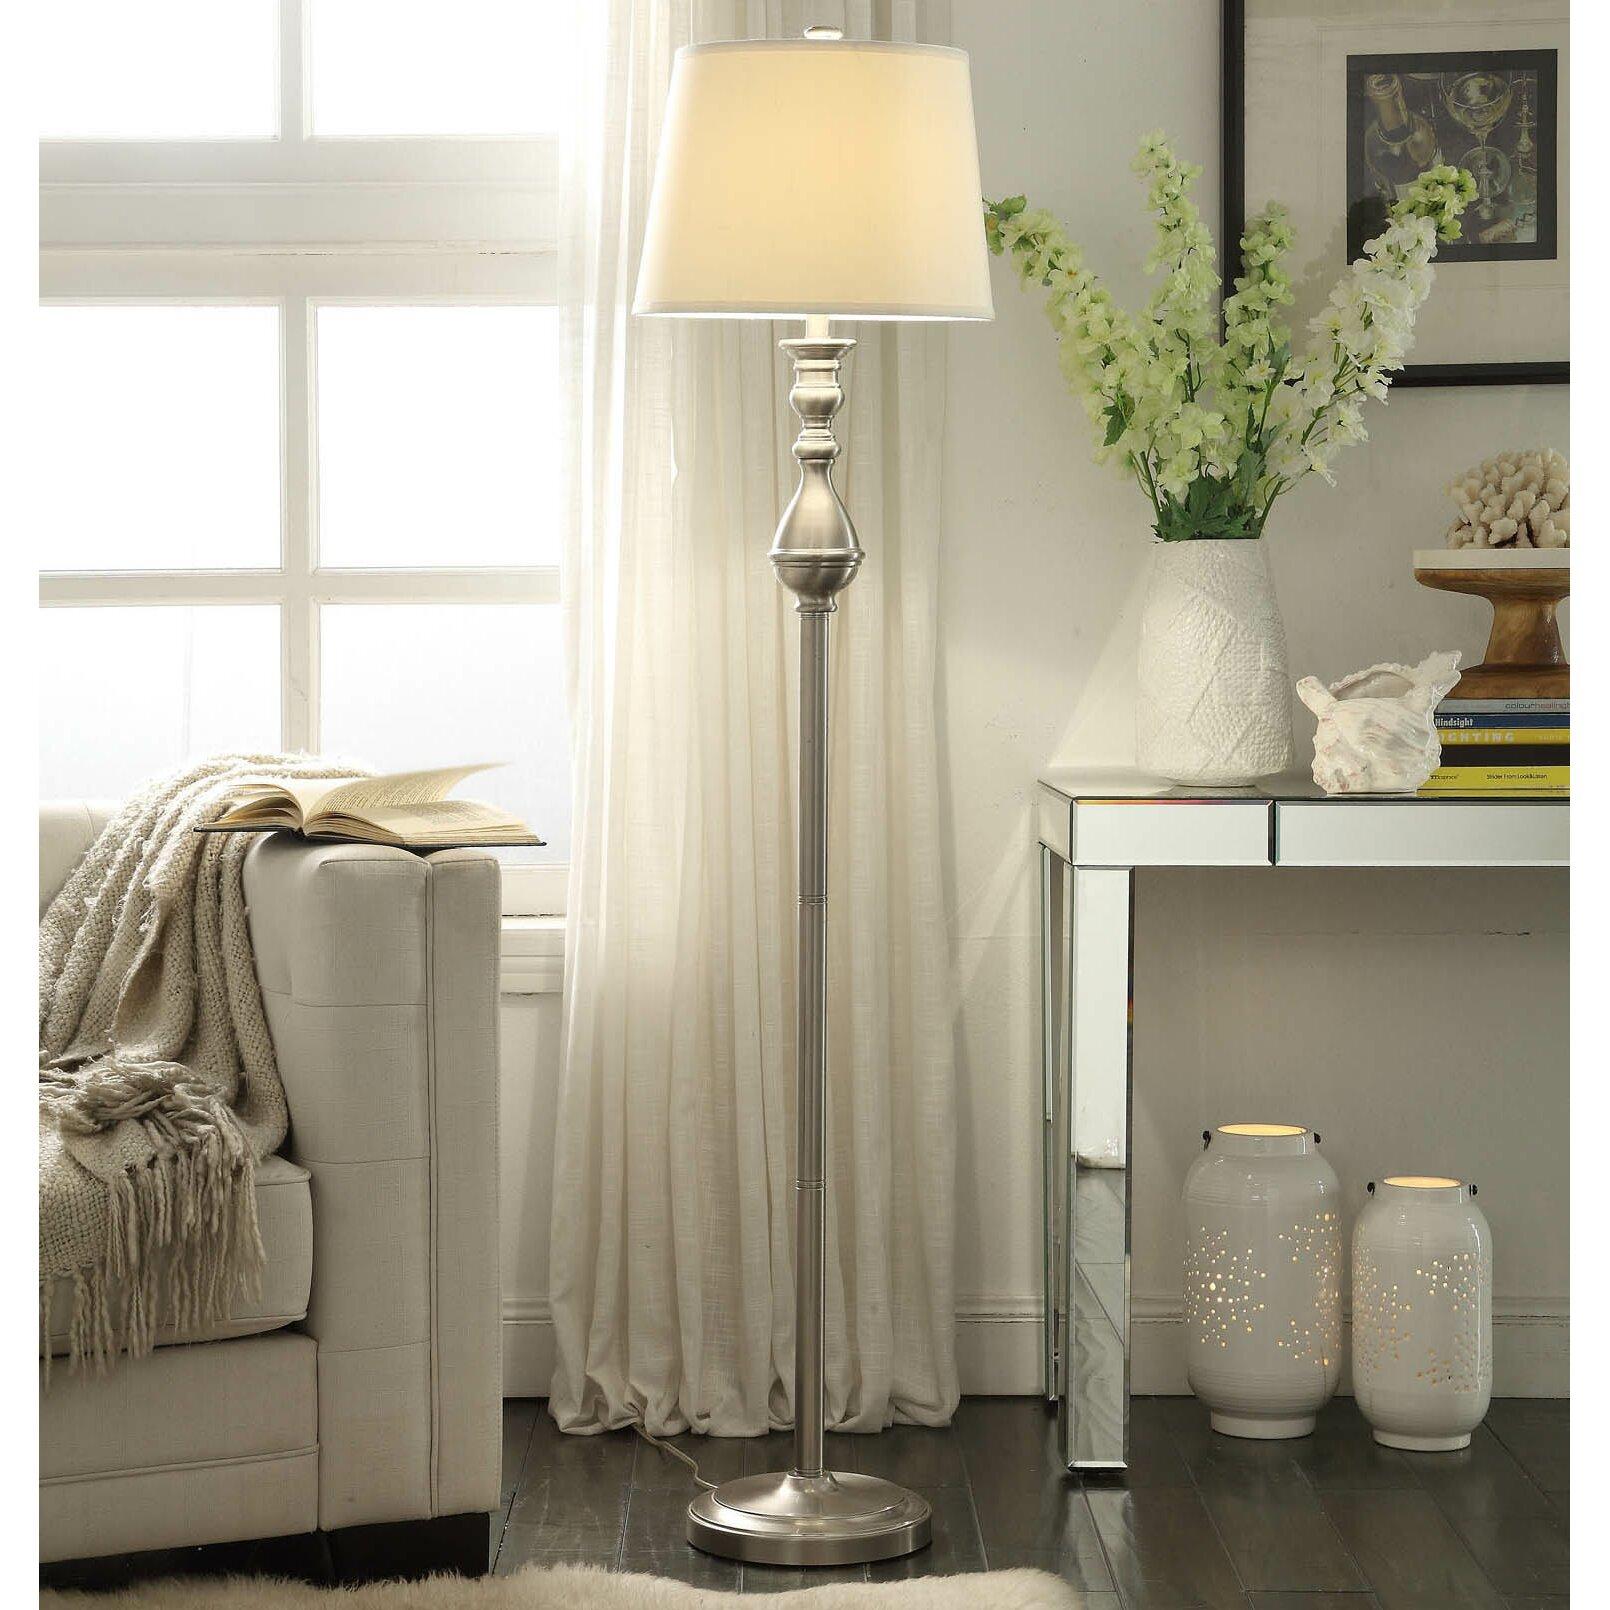 Base 1 2 3 Alvira Way Contoured Base Light Floor Lamp Elt